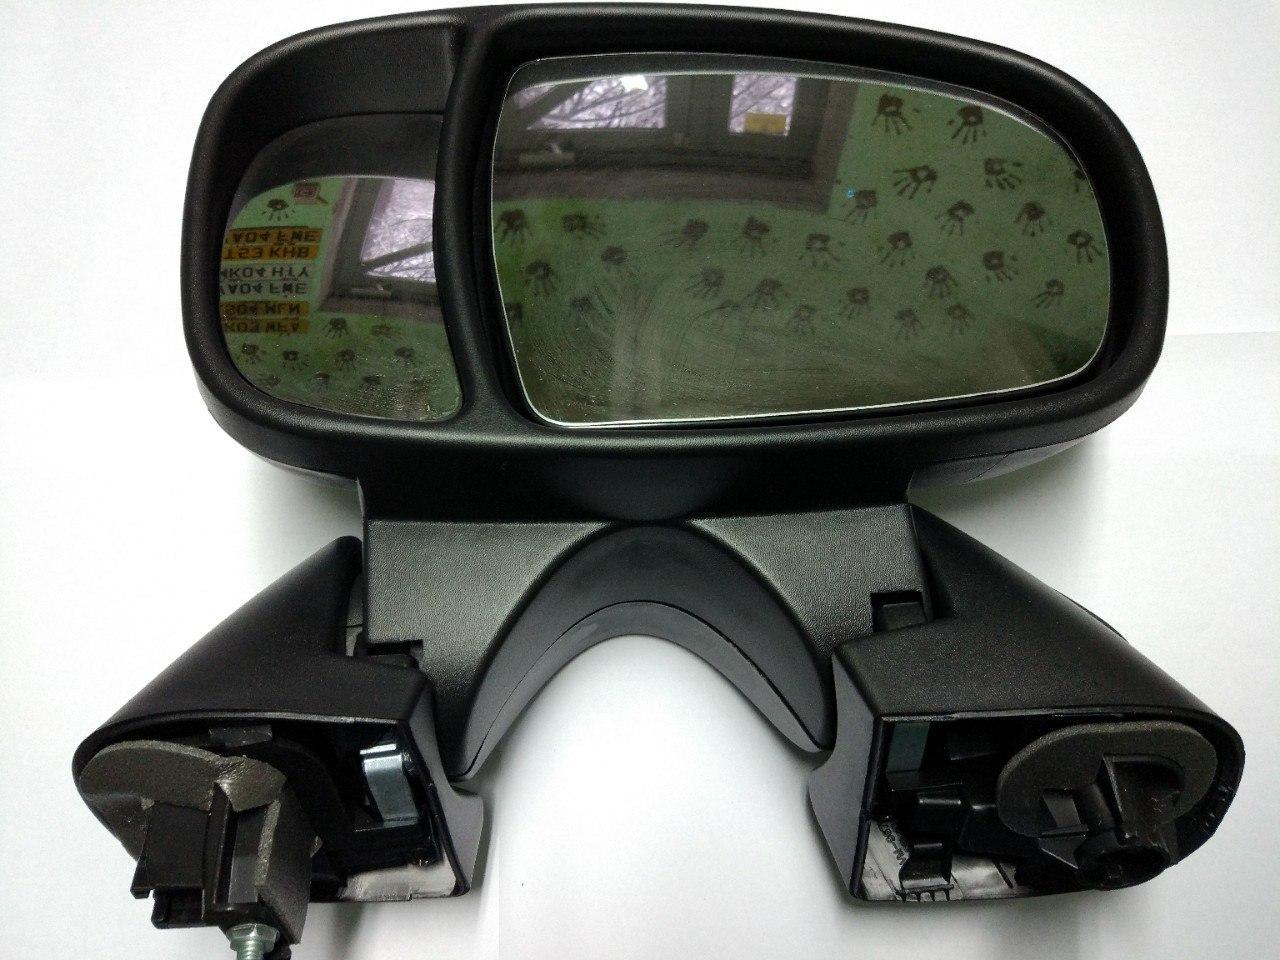 Зеркало заднього виду (електричне, L) Renault Trafic, Opel Vivaro 2001-2013, Polcar 6026514M